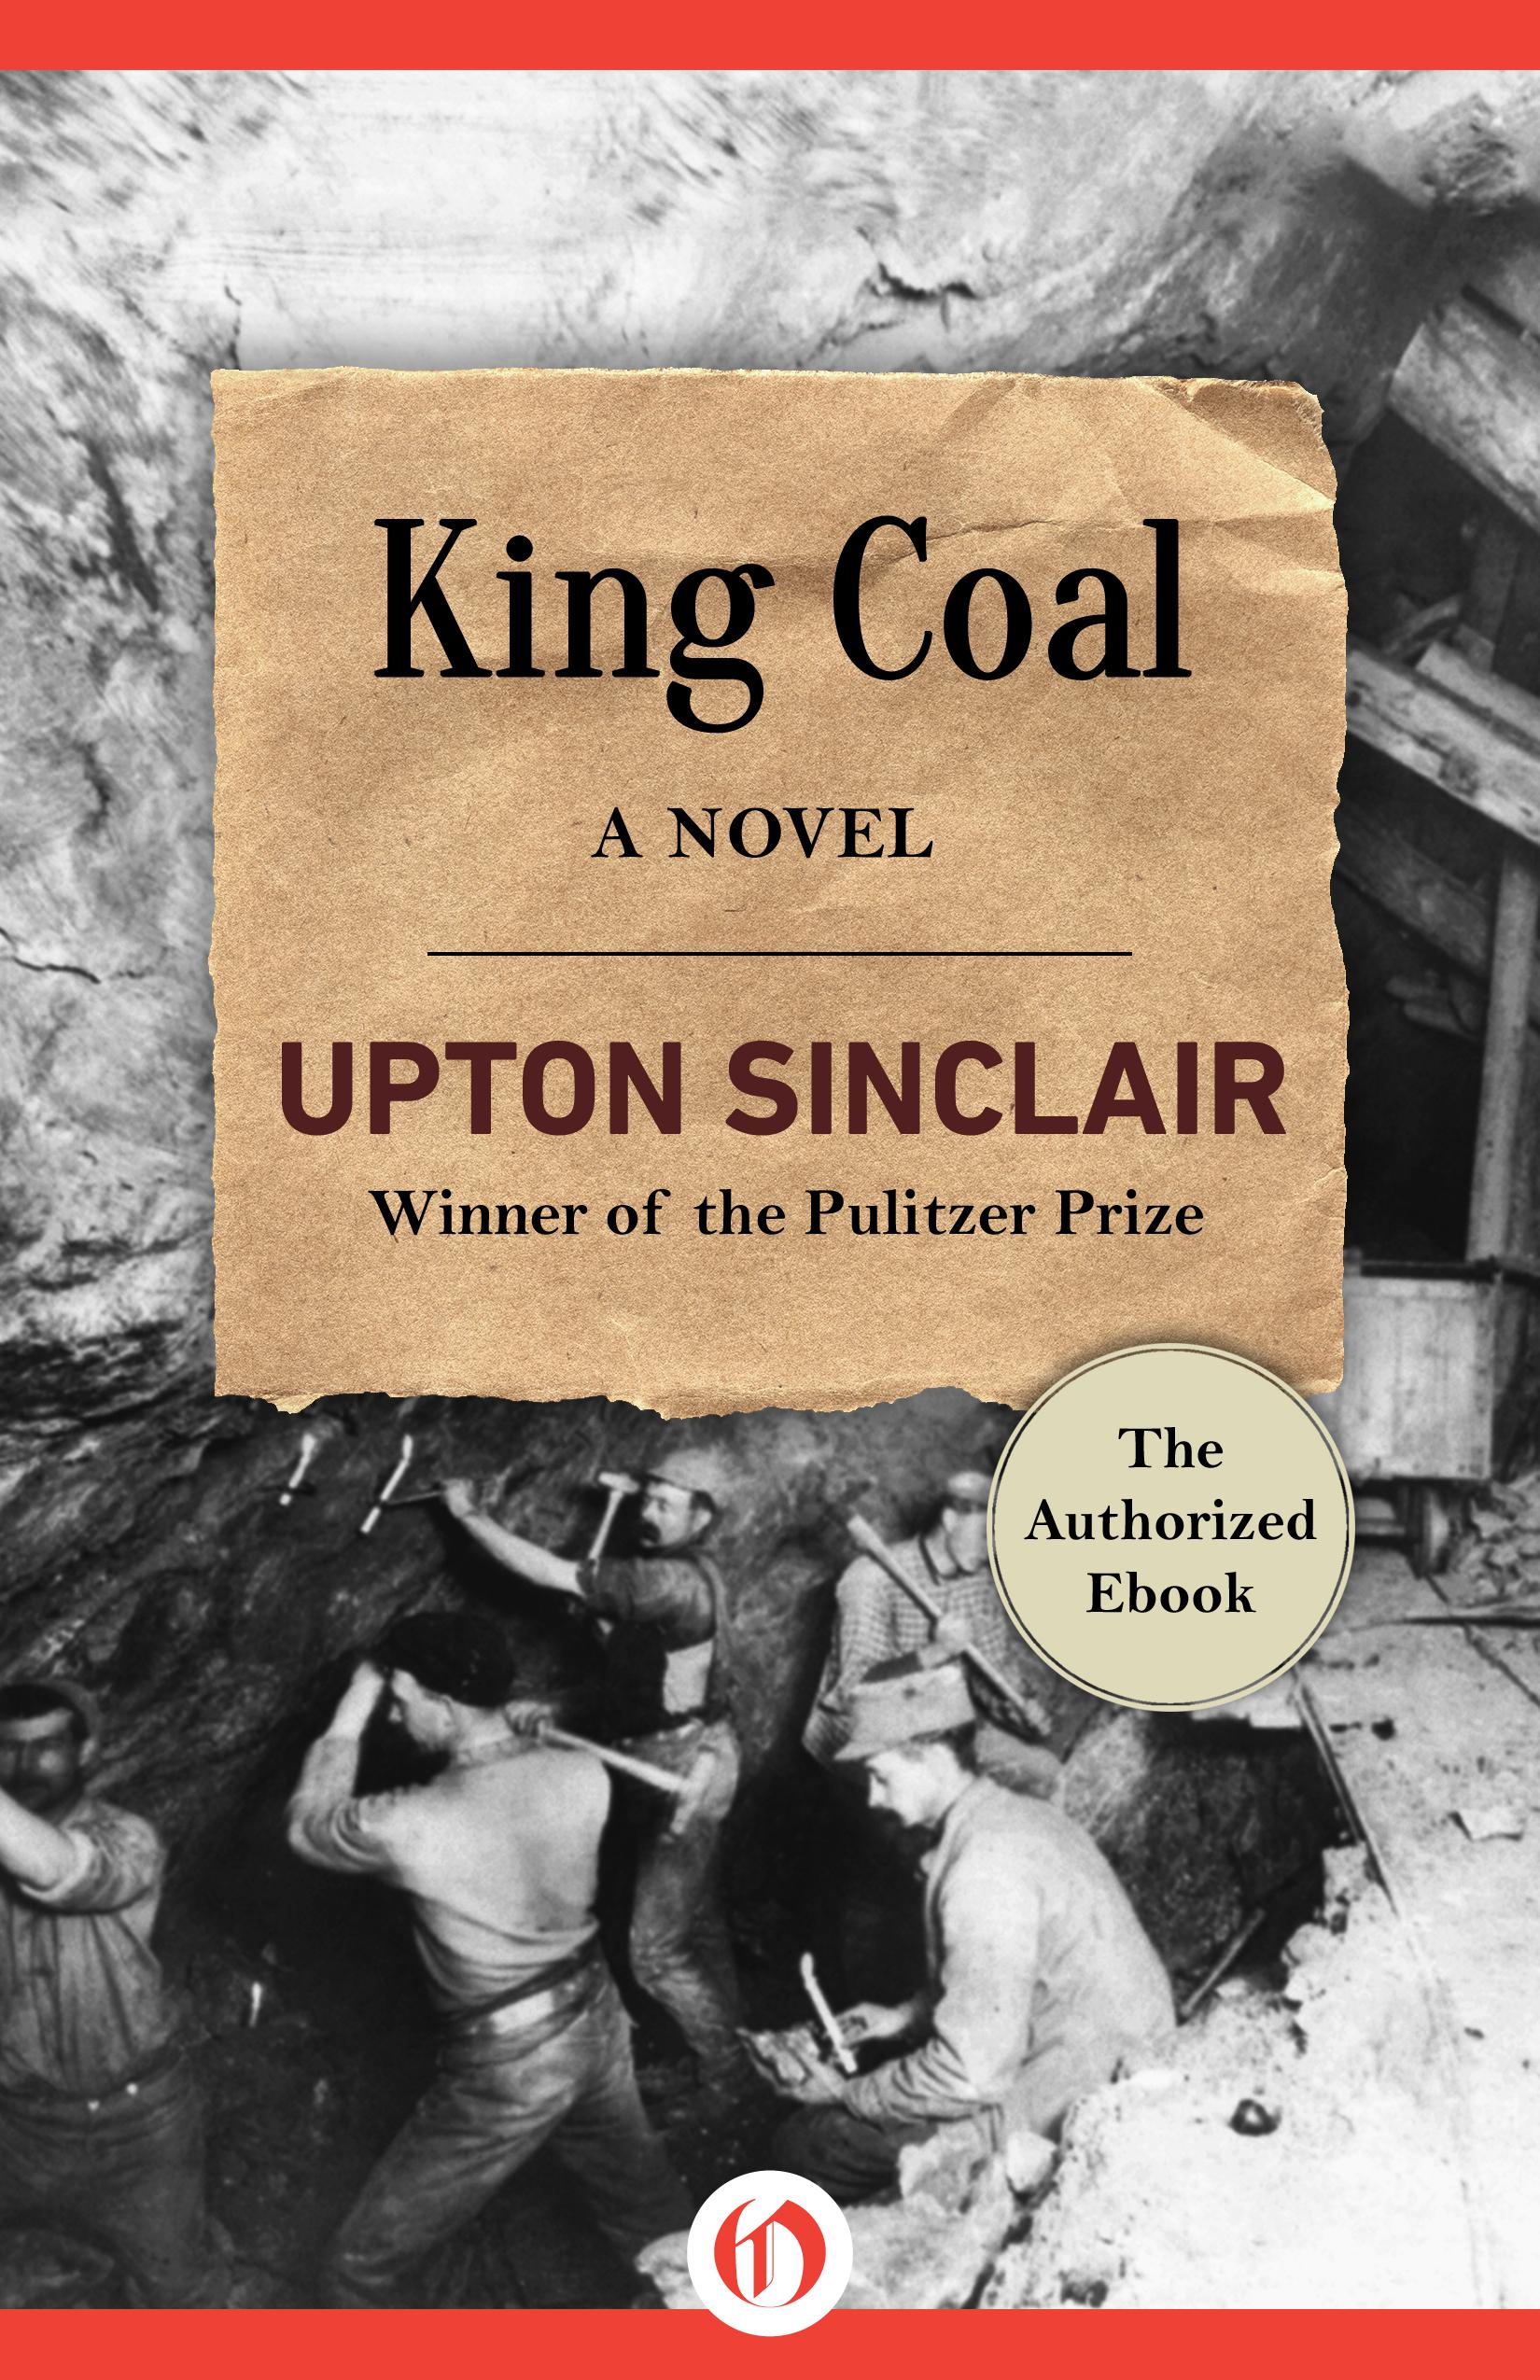 King Coal: A Novel Upton Sinclair